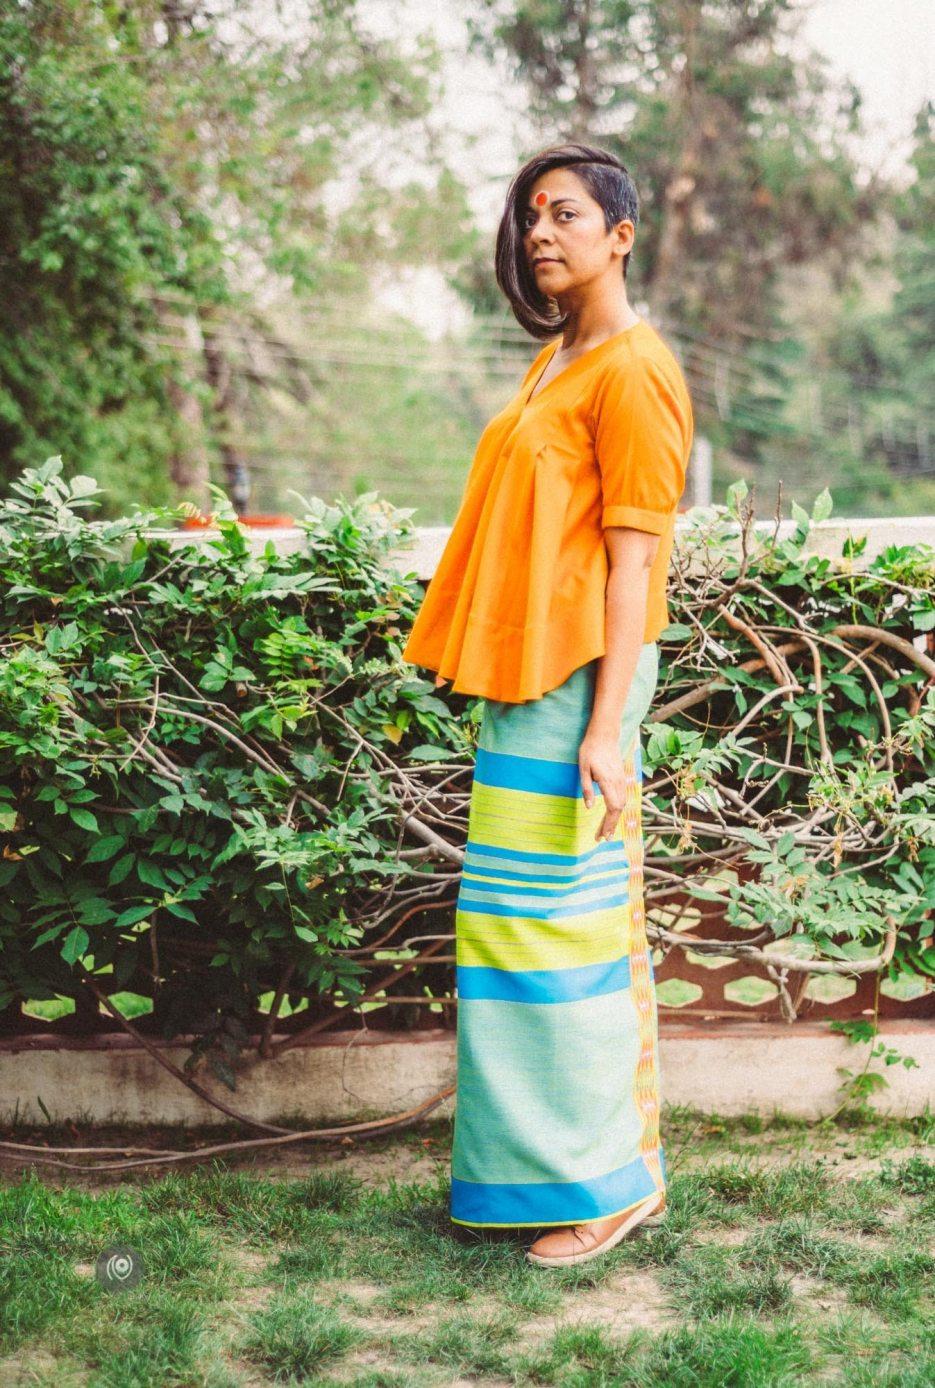 Naina.co, #NAINAxRanikhet, Ranikhet, Uttarakhand, Travel Photographer, Travel Blogger, Luxury Photographer, Luxury Blogger, Lifestyle Photographer, Lifestyle Blogger, Naina Redhu, #EyesForDestinations, #EyesForIndia, Destination Blogger, Destination Photographer, #CoverUp, Personal Style, Travel Style, Kallol Datta, Gaaley, Arunachal Pradesh, Traditional Wear, Clothing, Fashion